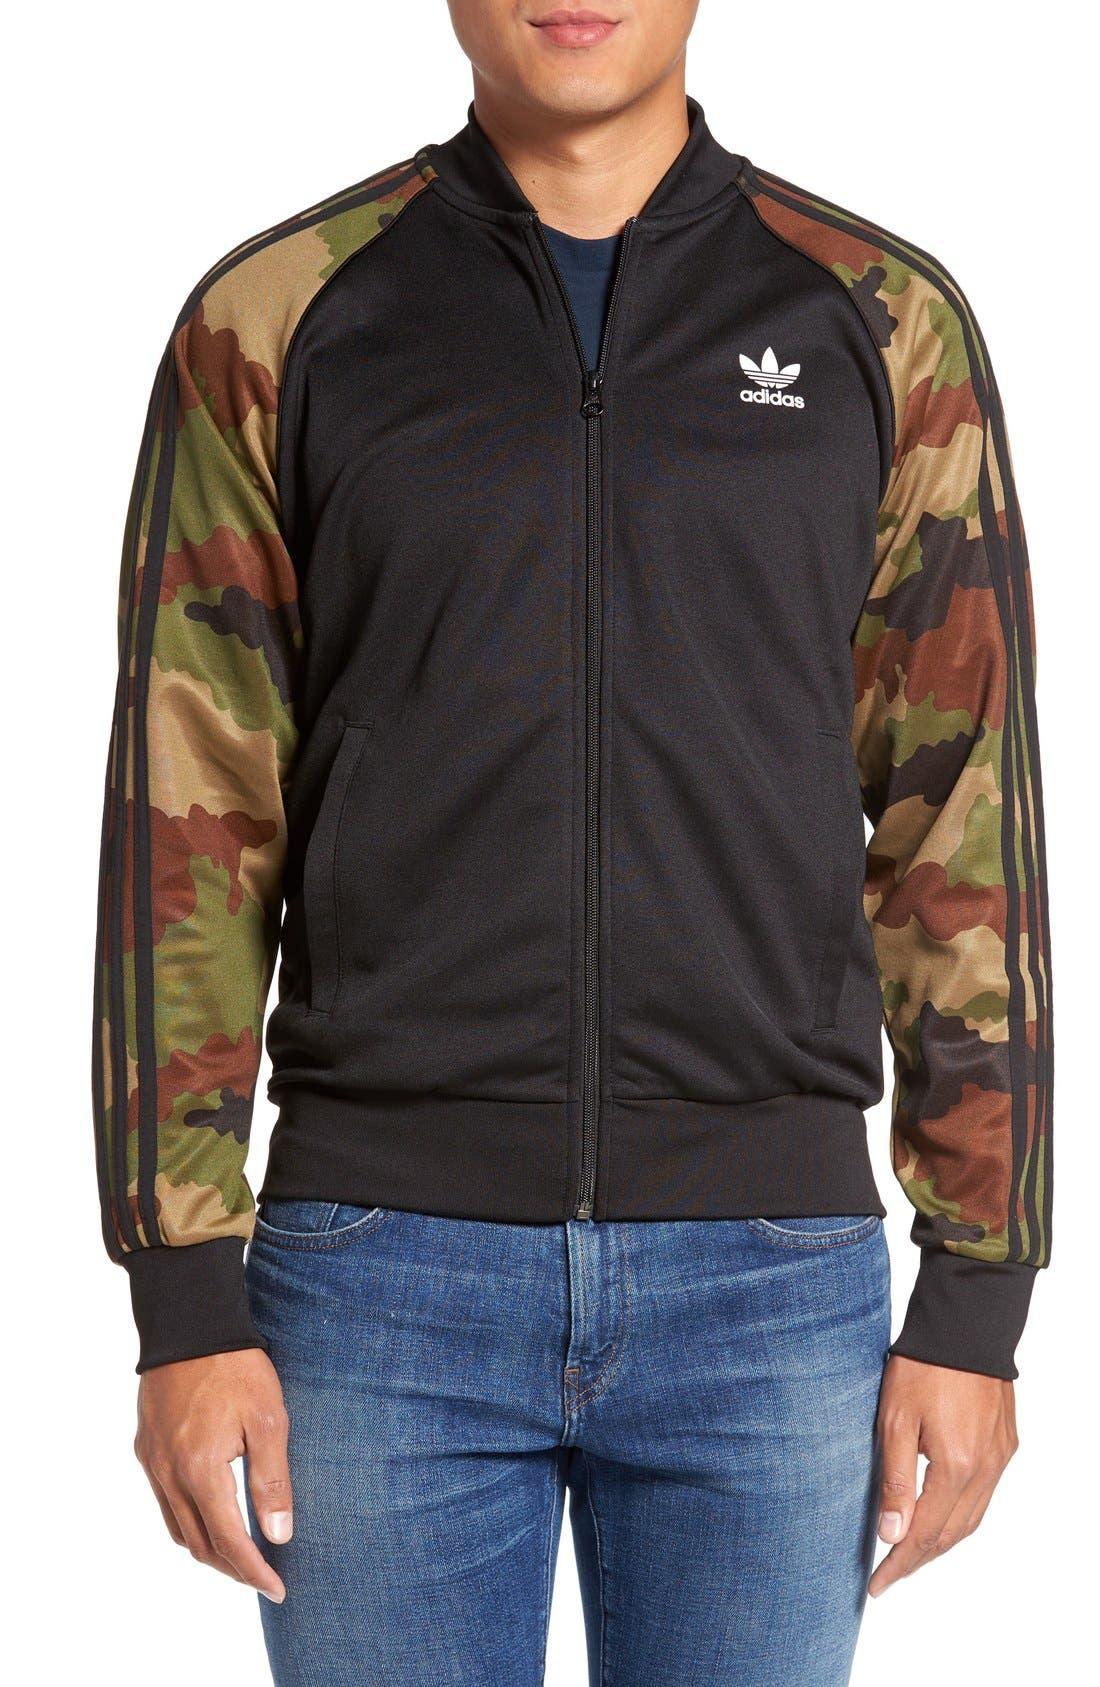 Buy cheap adidas originals camo bomber jacket >Up to OFF43